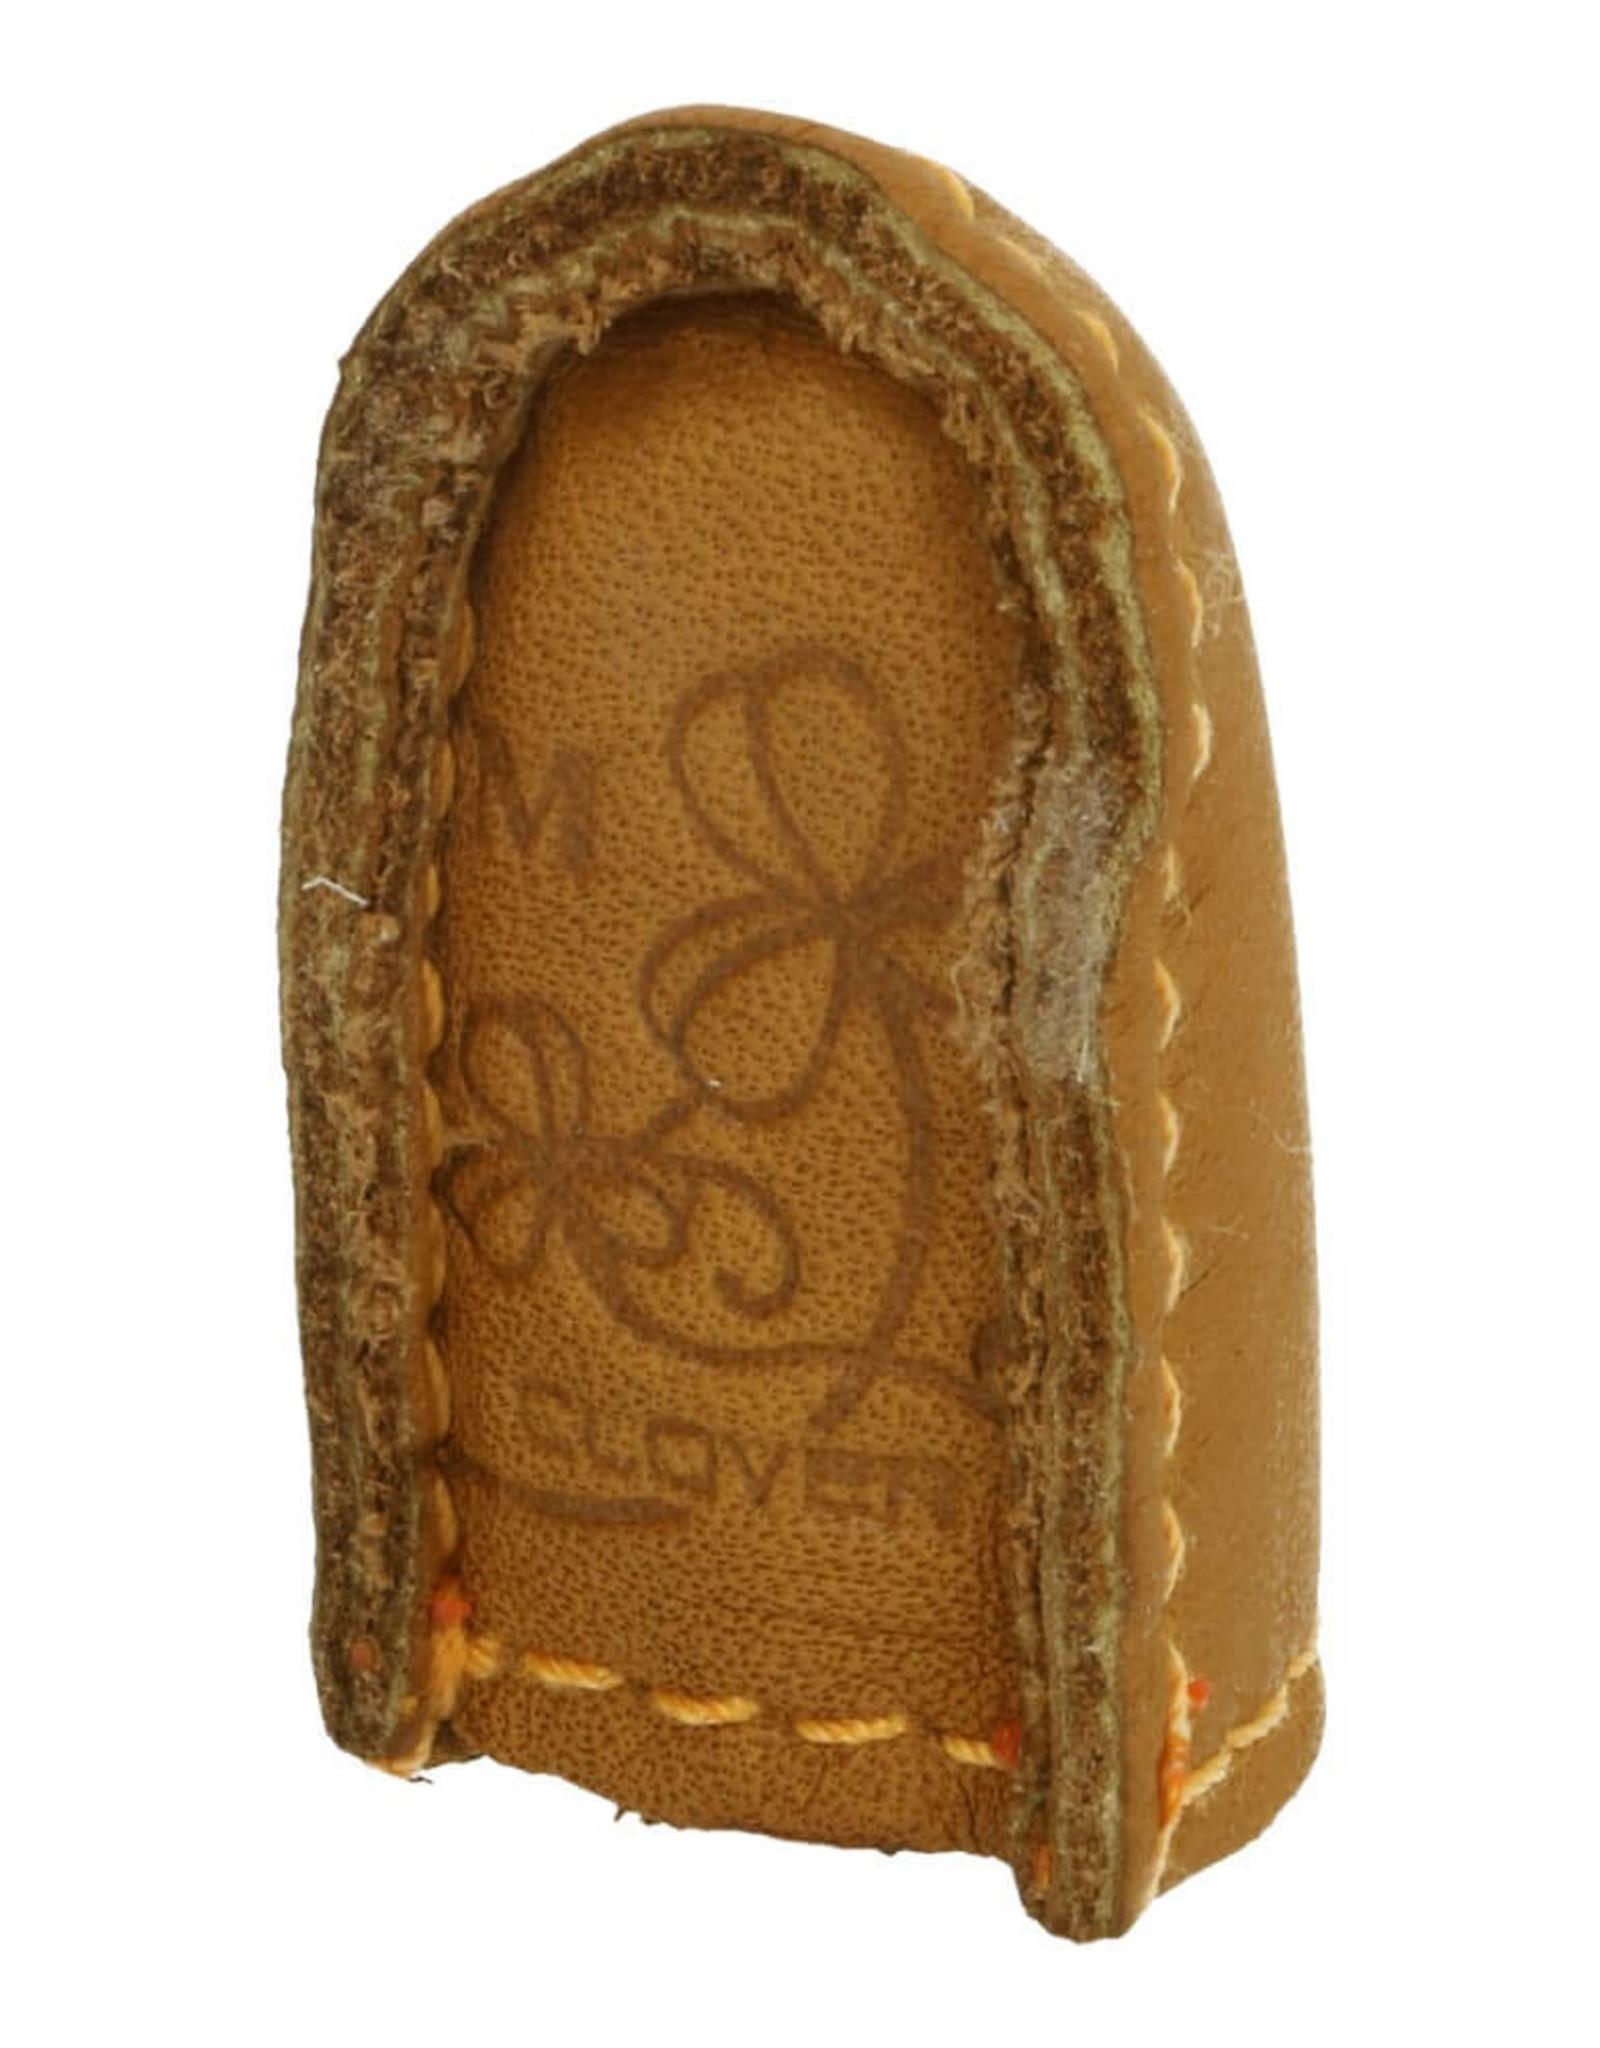 clover Clover Vingerhoed Leer Natural Grip M (1stuk)